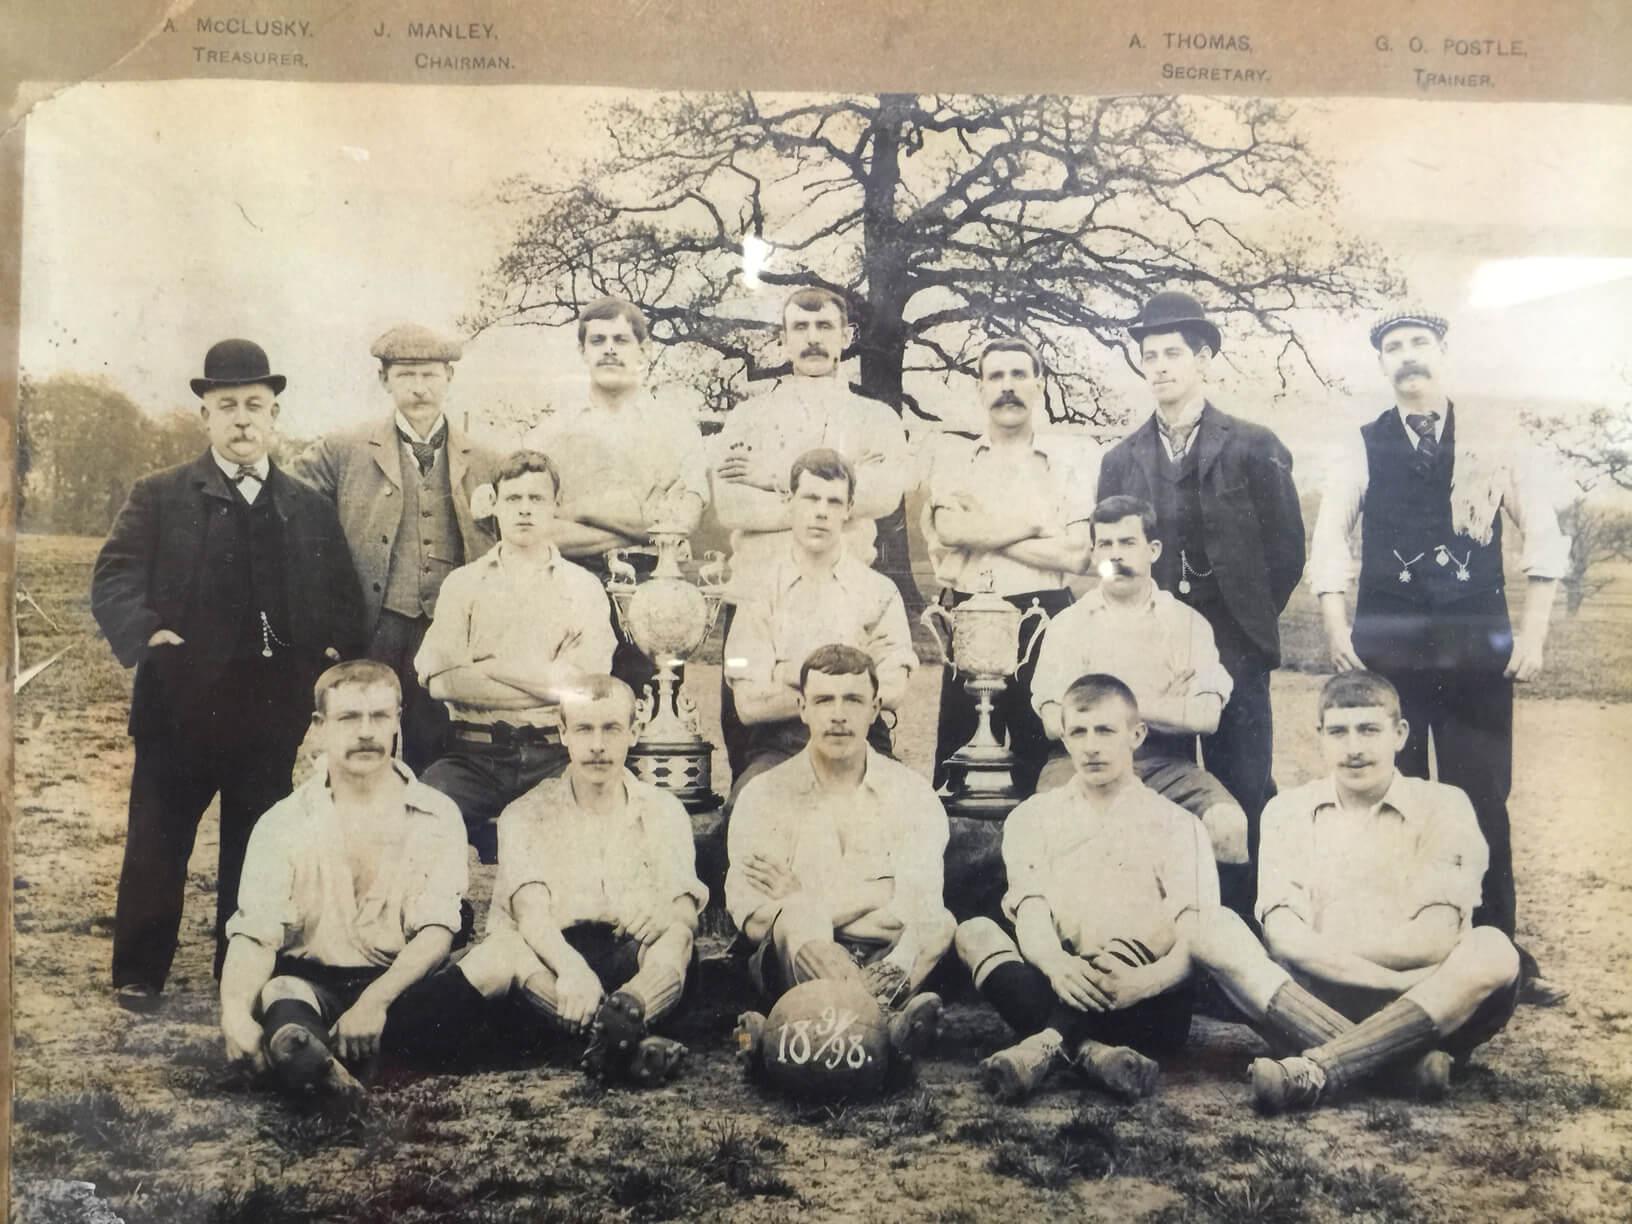 An old photograph of a local football team